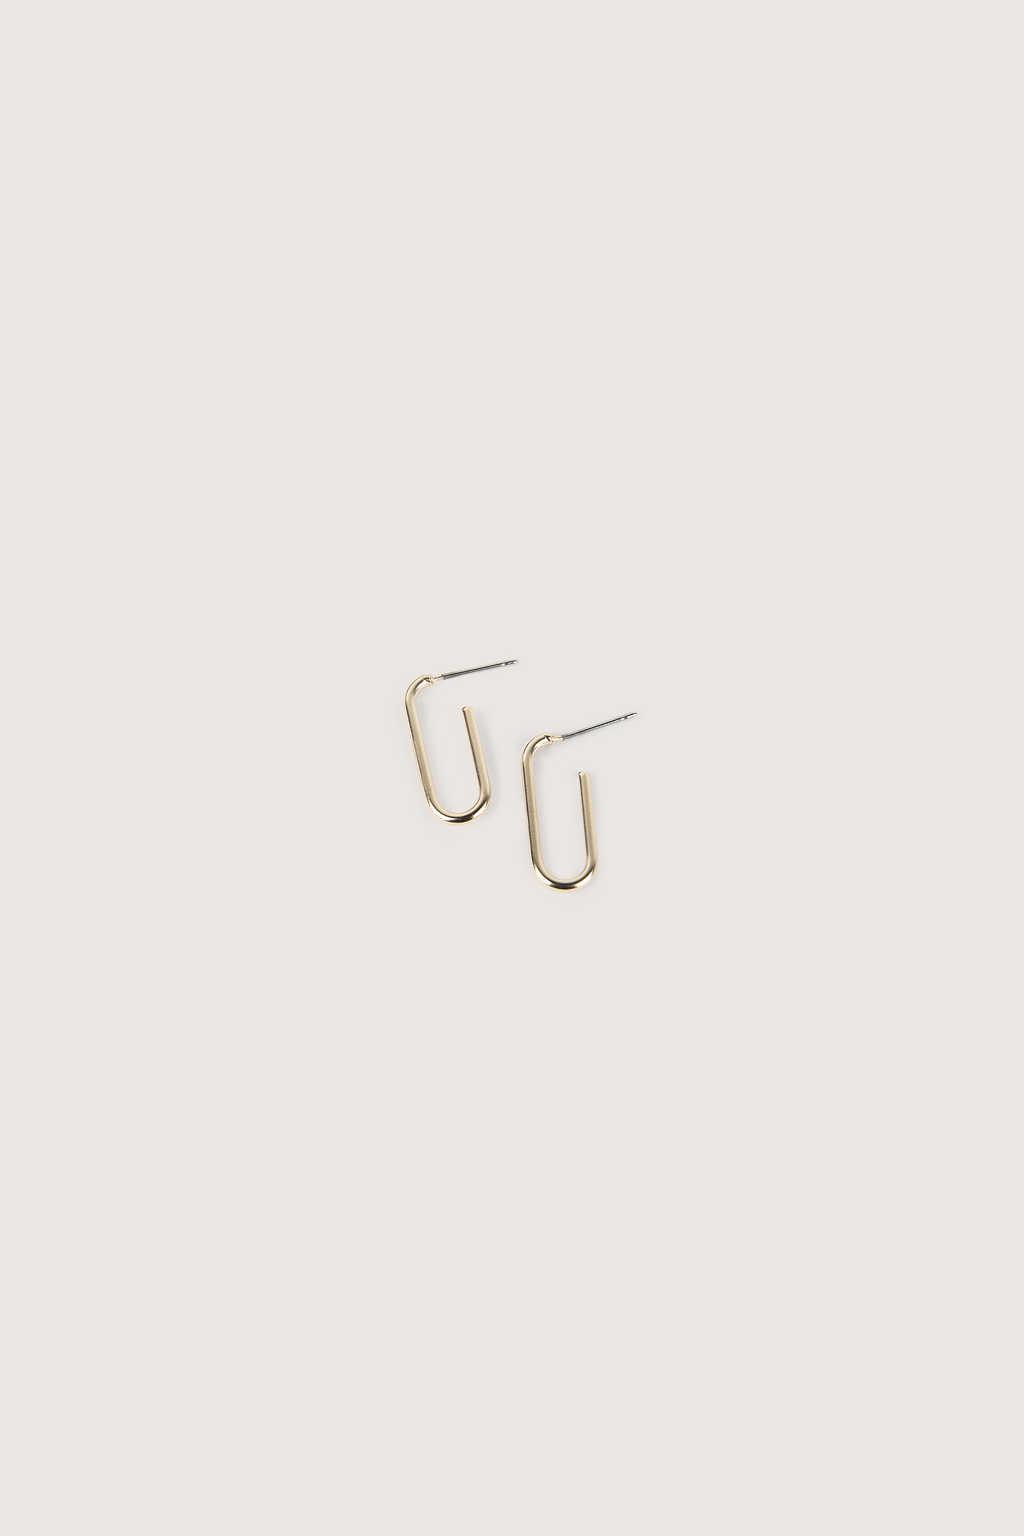 Earring H244 Gold 1